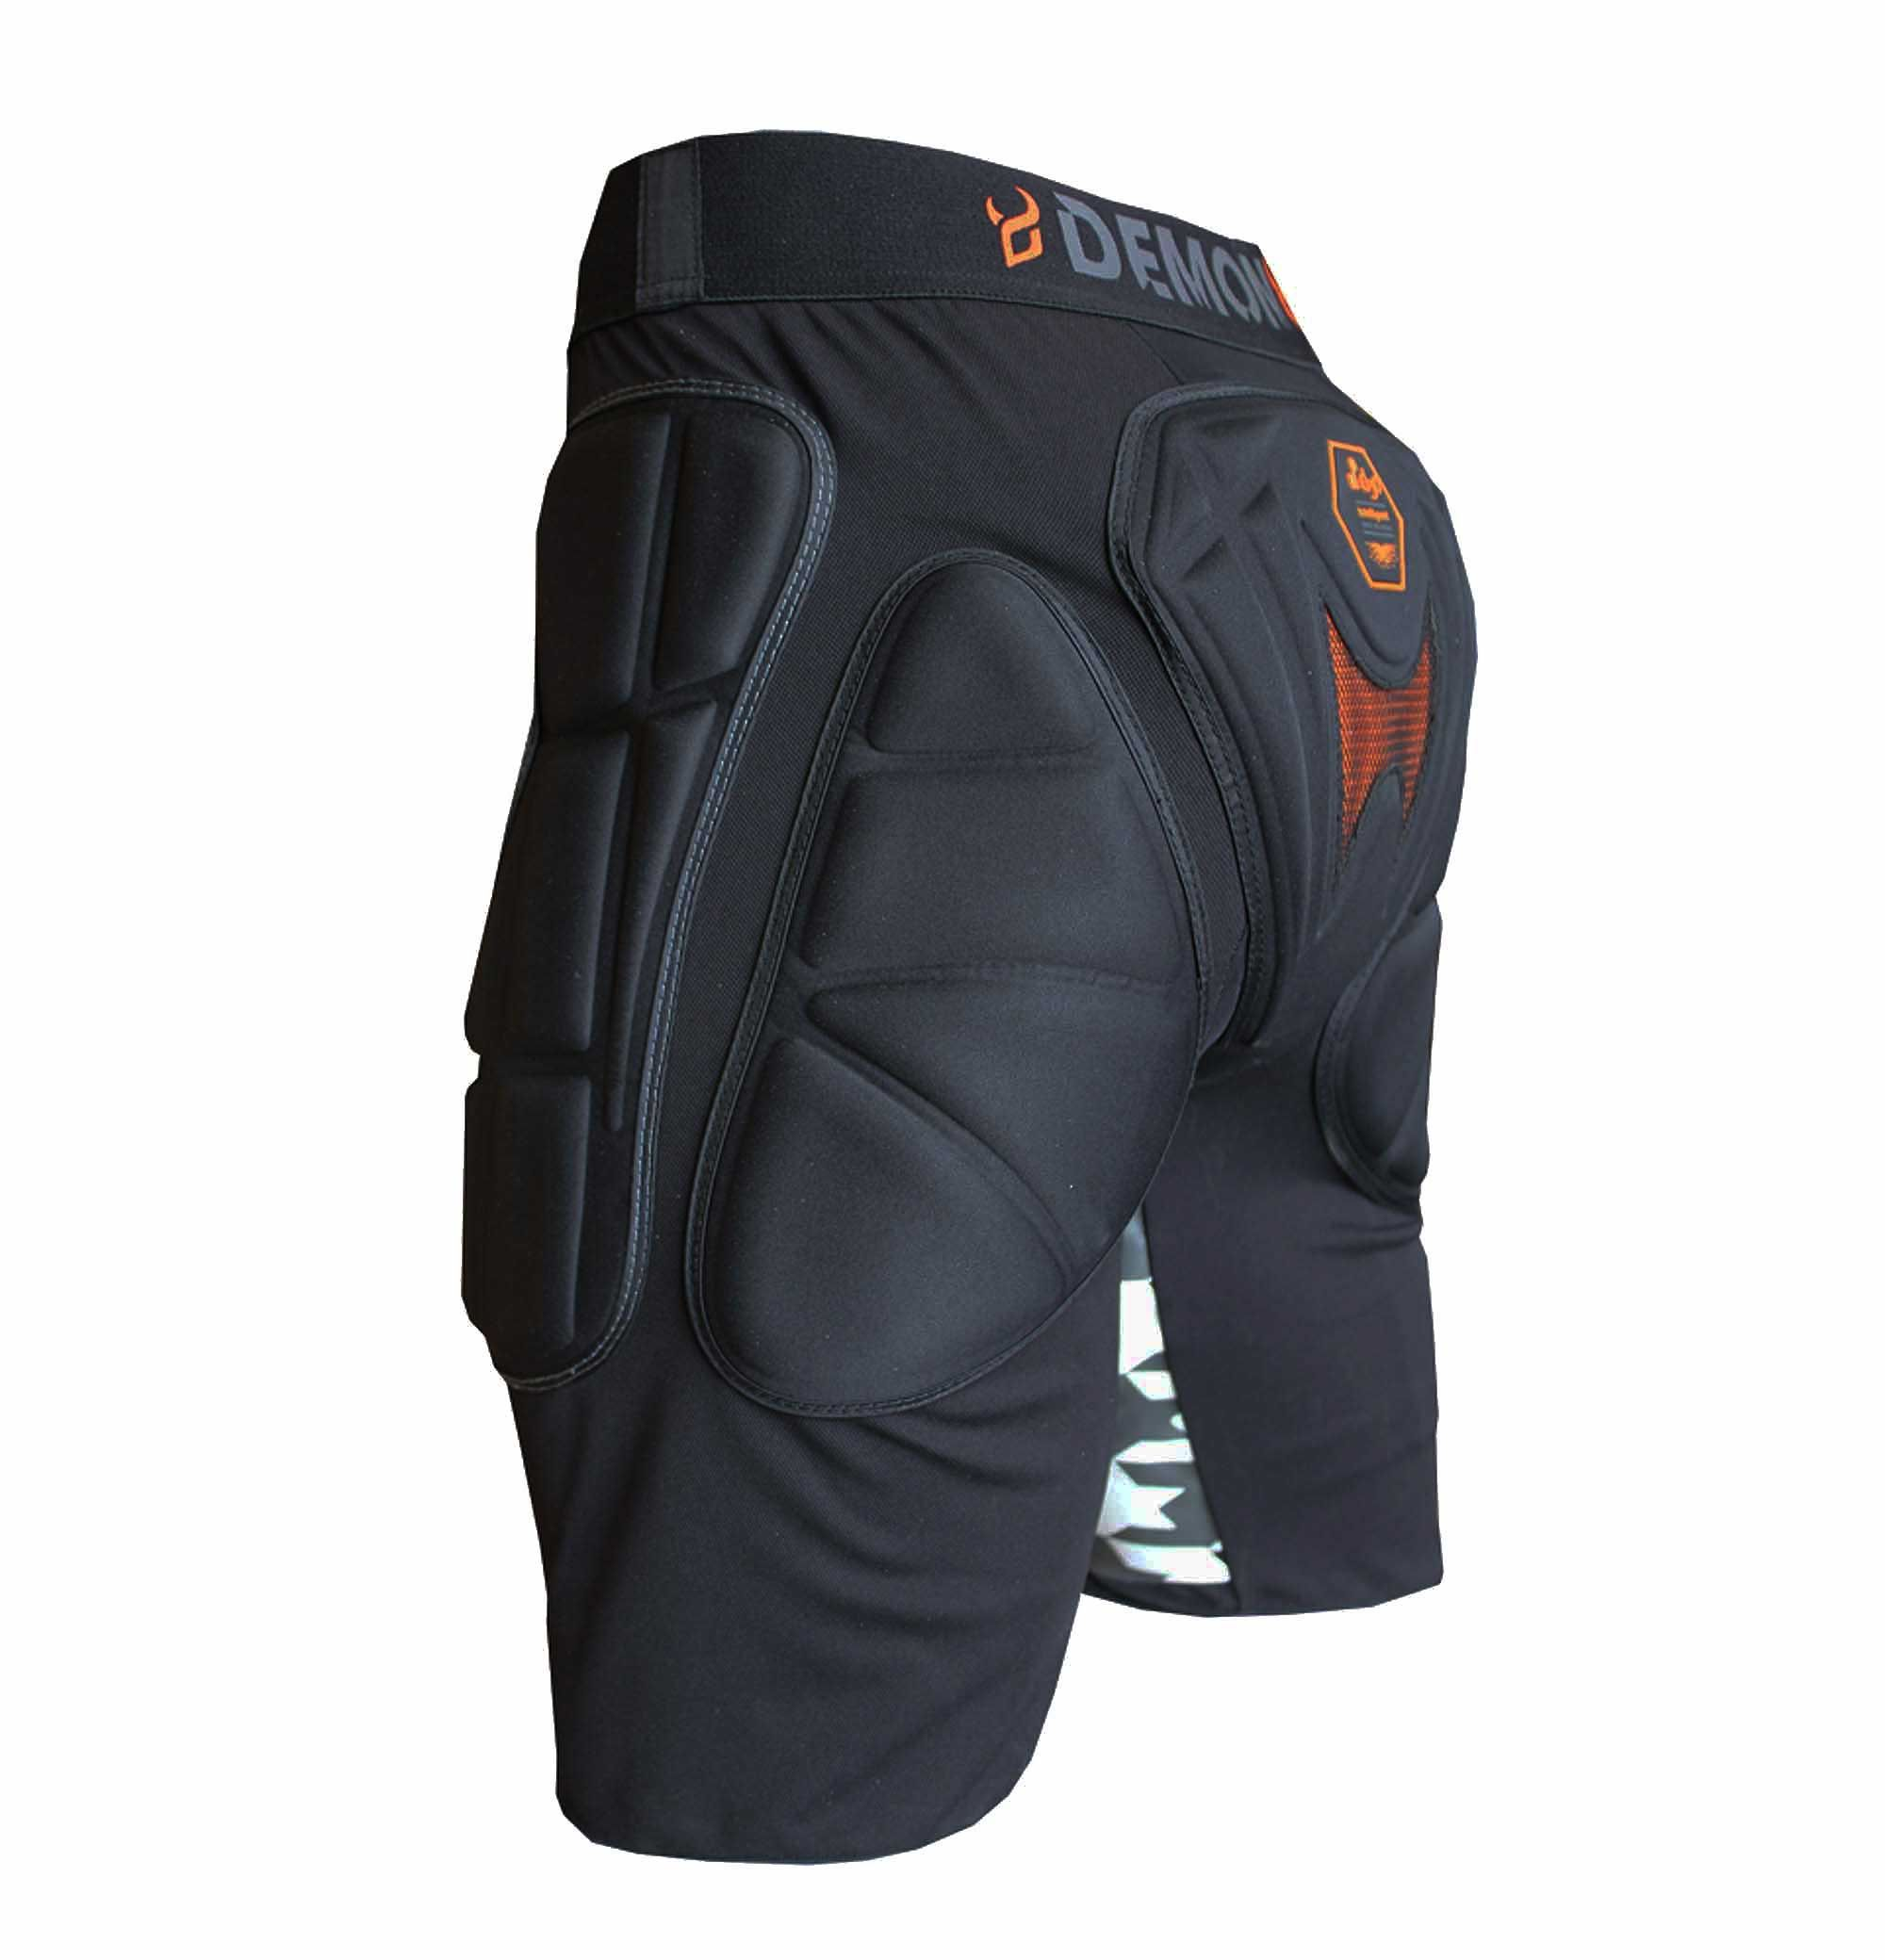 demon flex force x d3o impact shorts in black